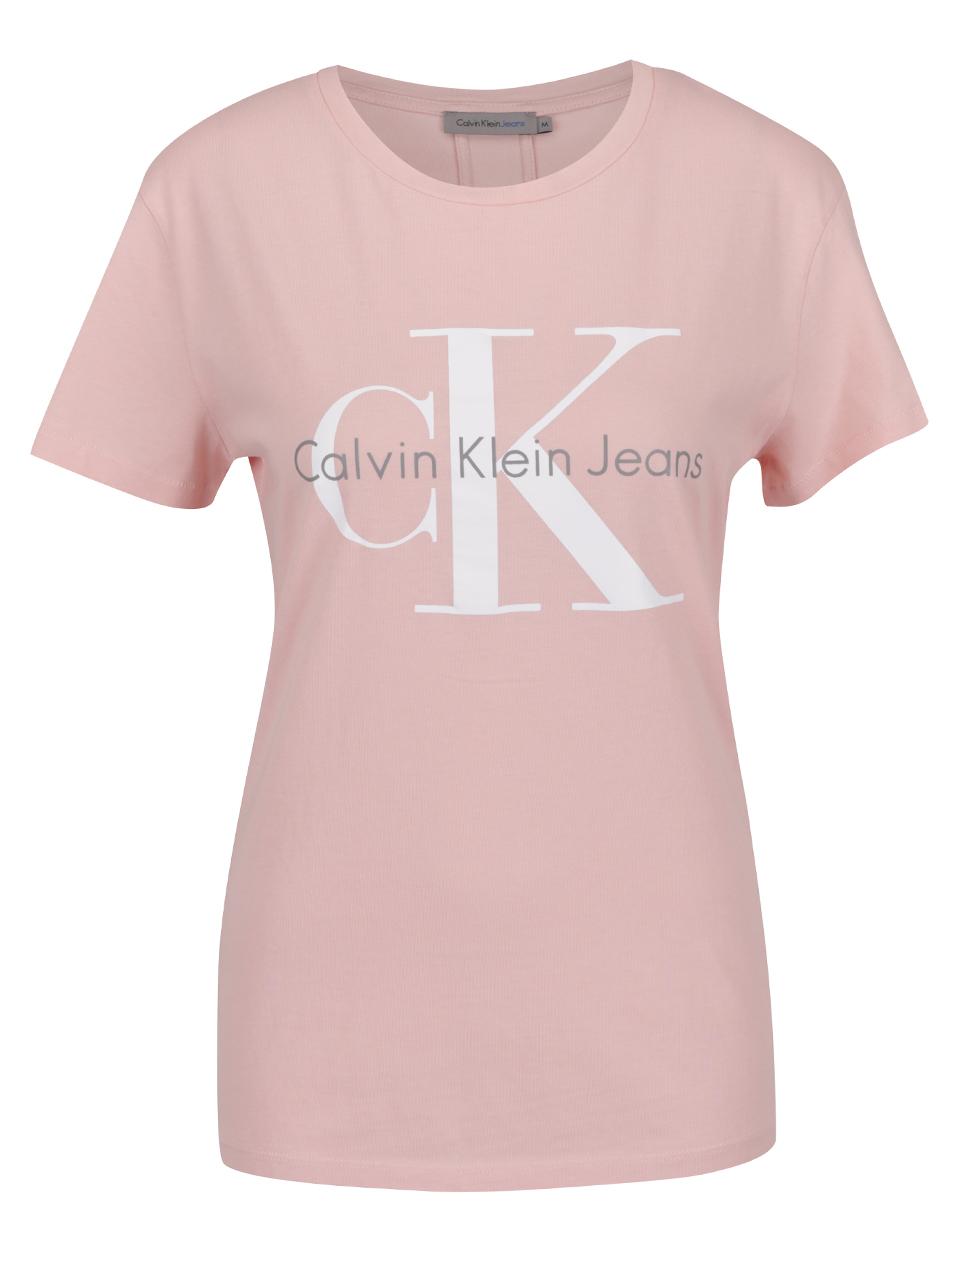 ece138ddc1c Světle růžové dámské tričko Calvin Klein Jeans Shrunken